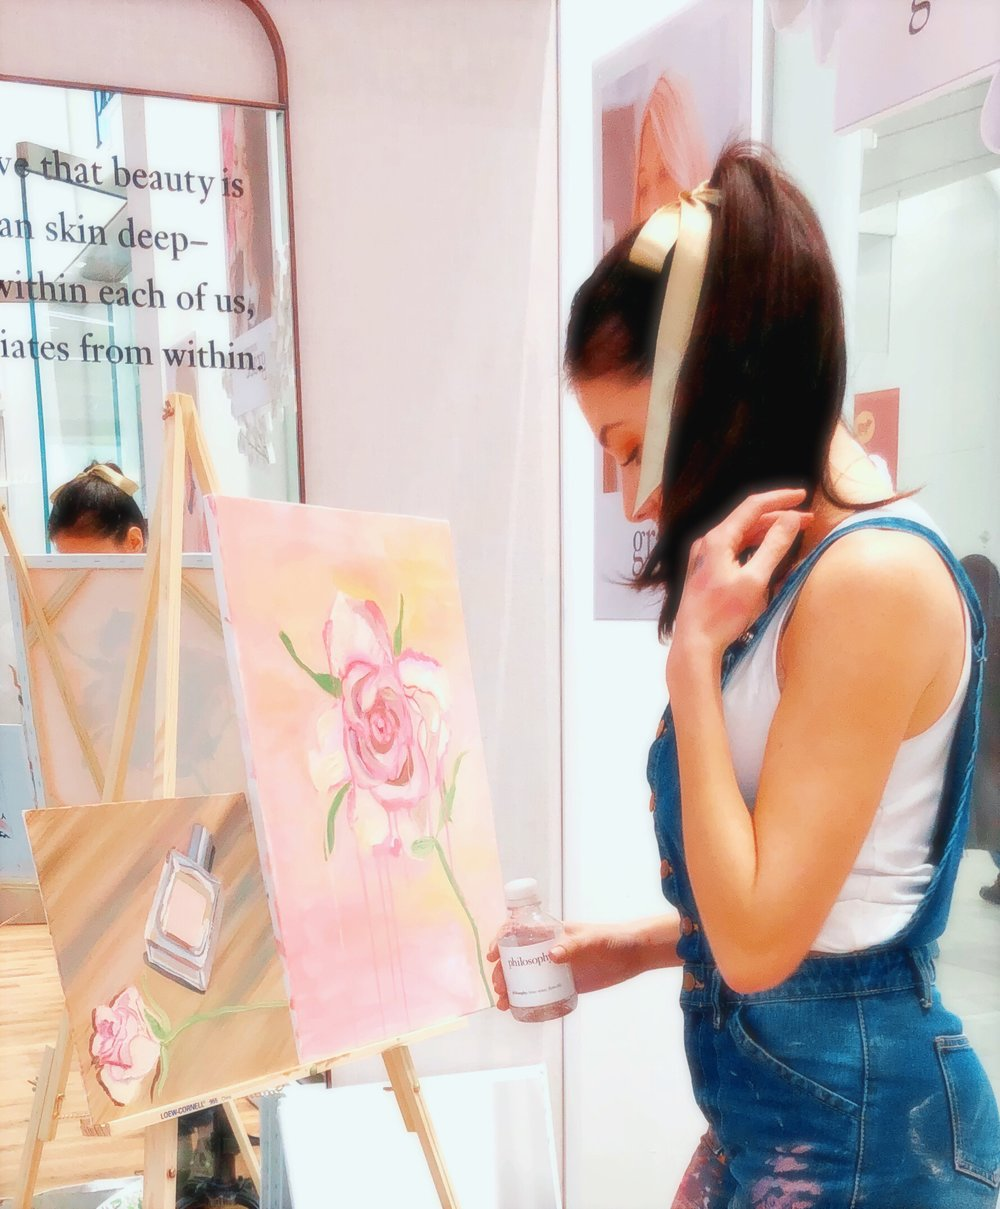 katrina-eugenia-philosophy-skincare-love-philosophy-amazing-grace-amazing-grace-ballet-rose-live-painting-oil-painting87.JPG